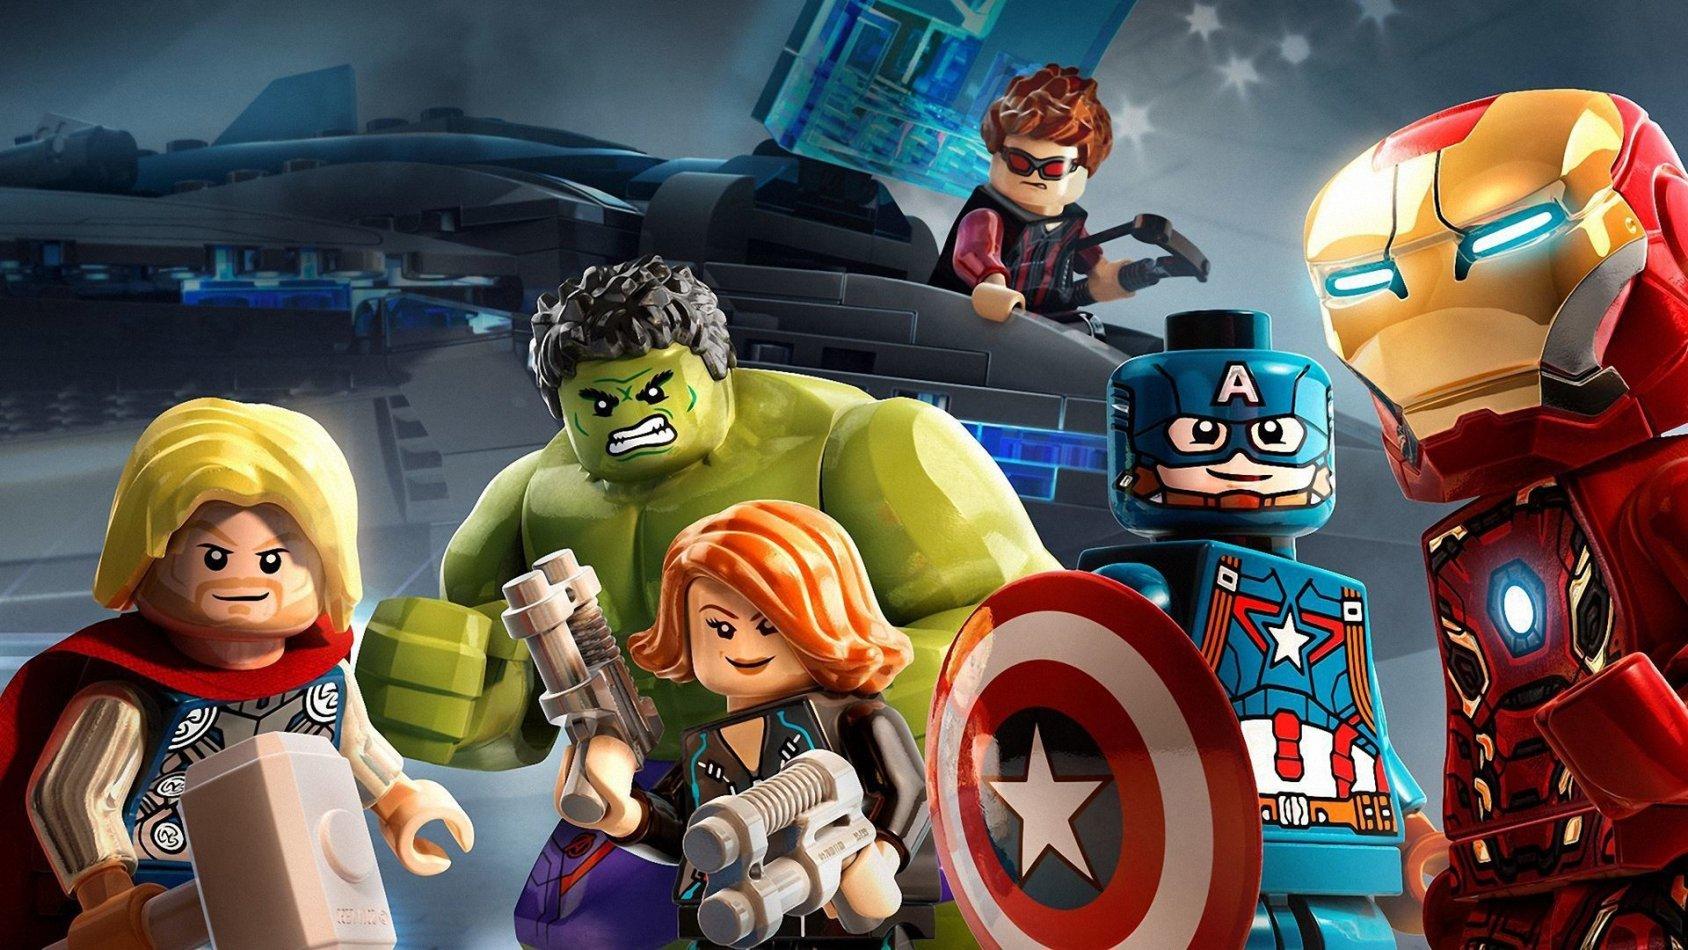 LEGO Marvel Superheroes: Avengers Reassembled - sv.tal